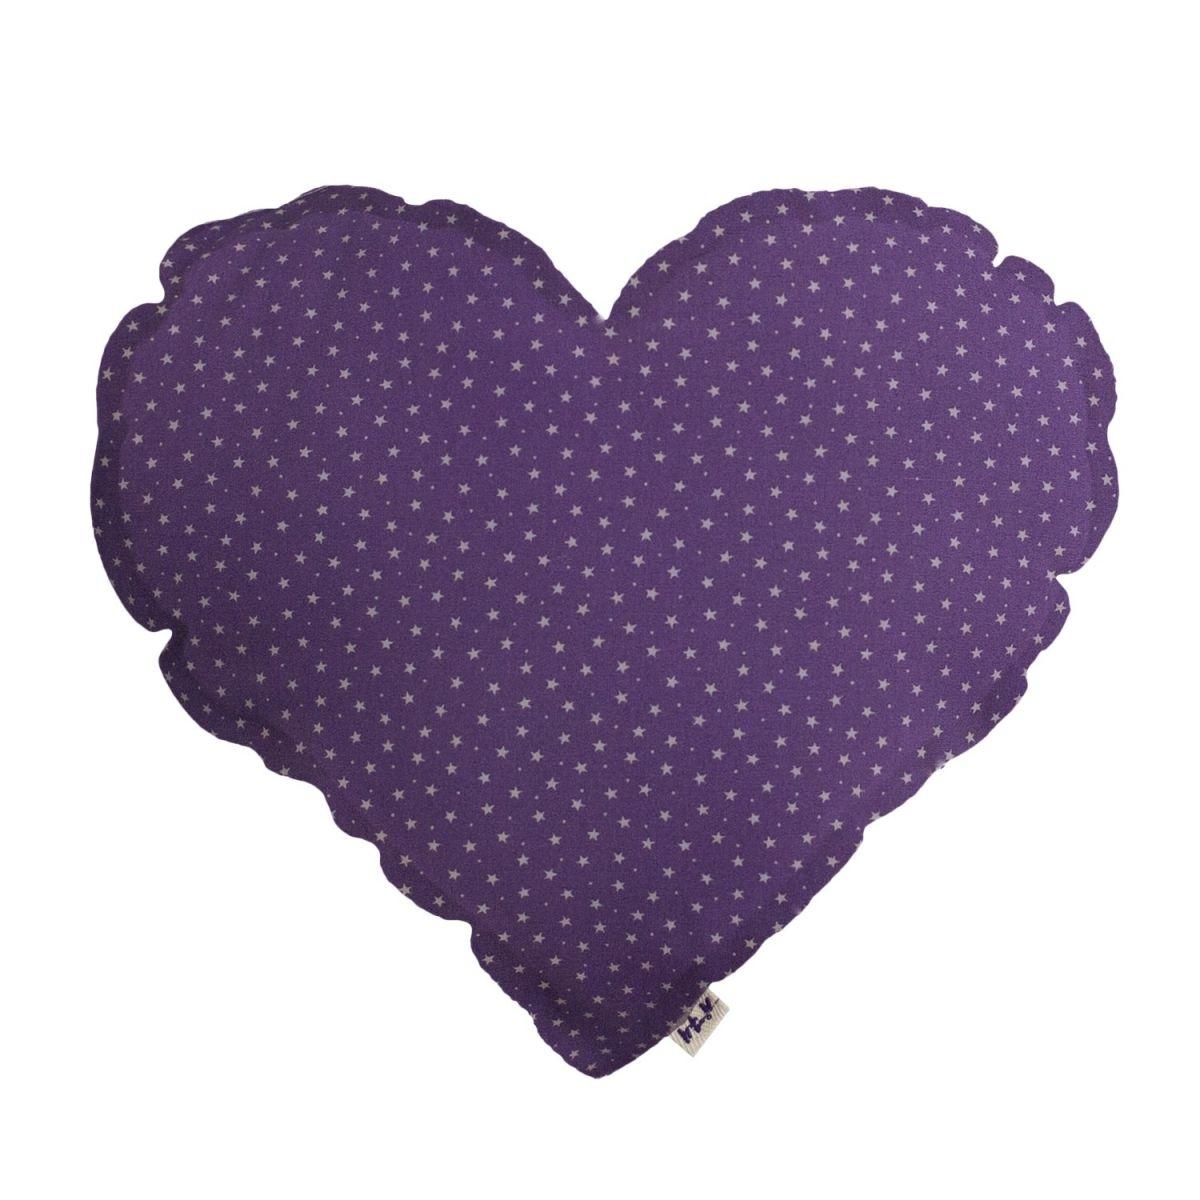 Heart Cushion purple with beige stars - Numero 74